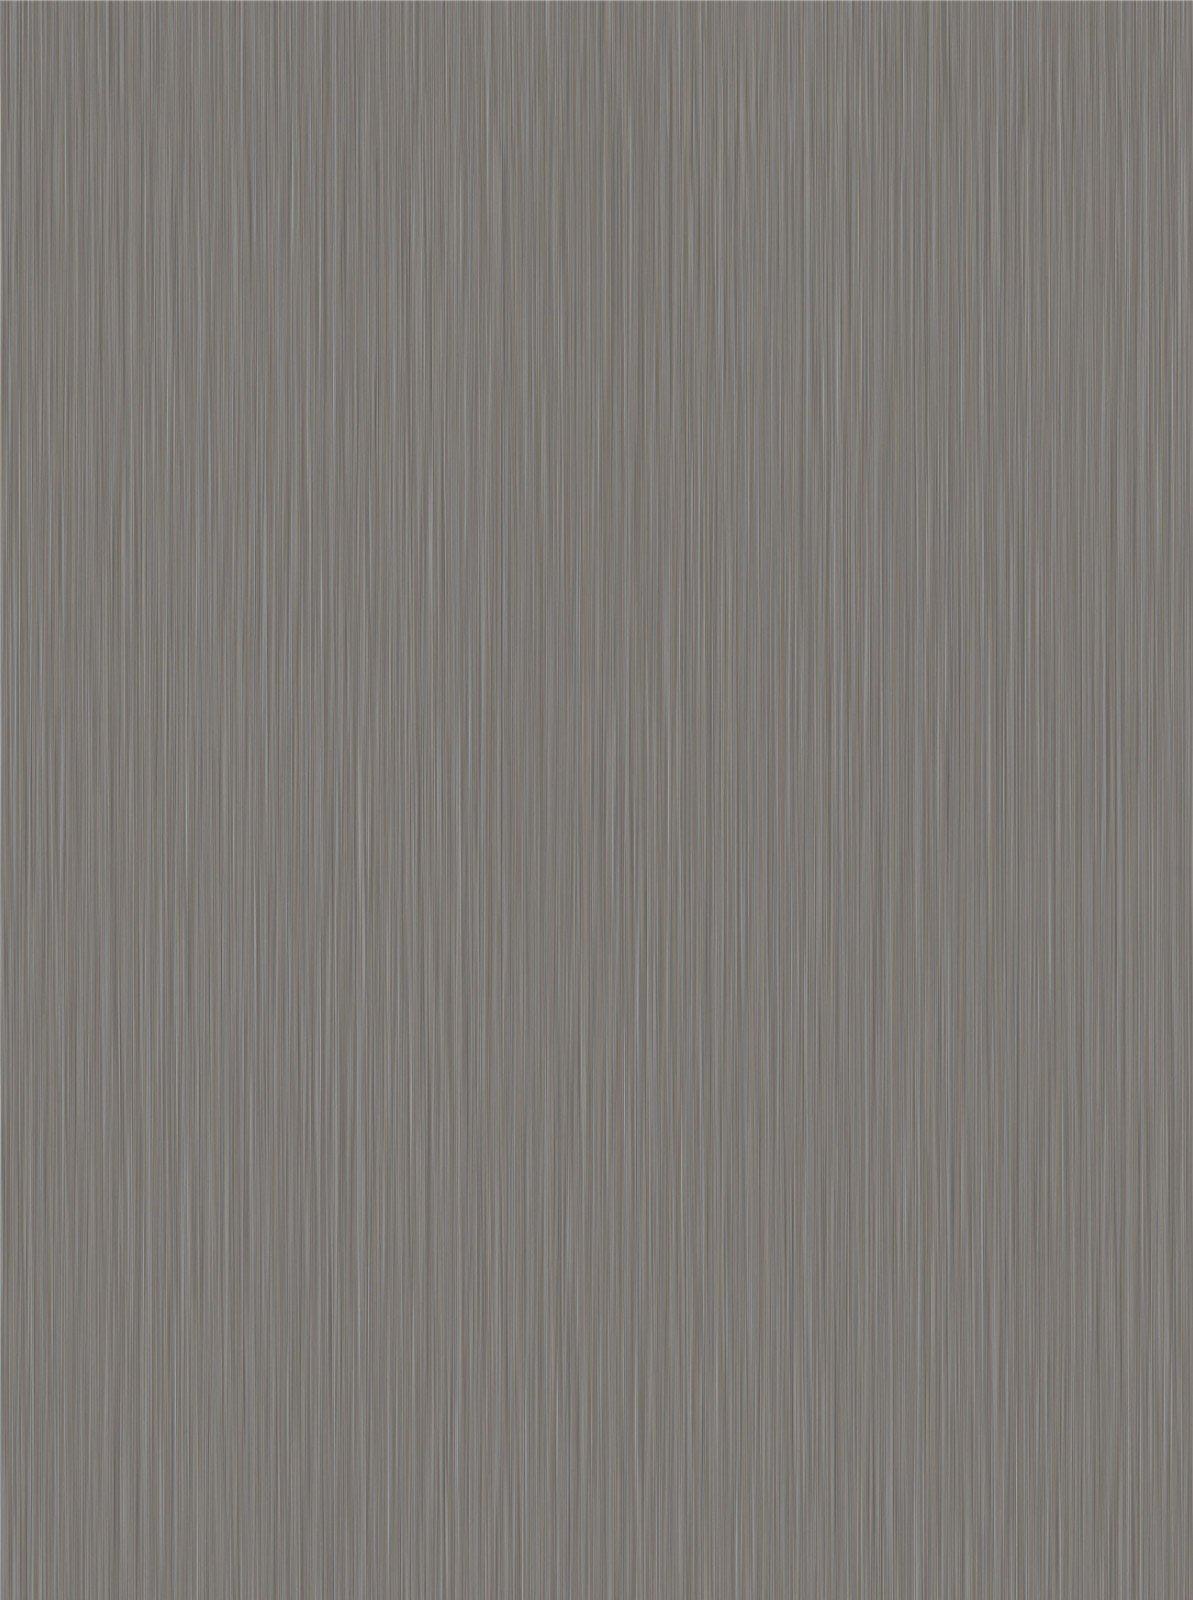 oak decor paper manufacturers design for gallery-1